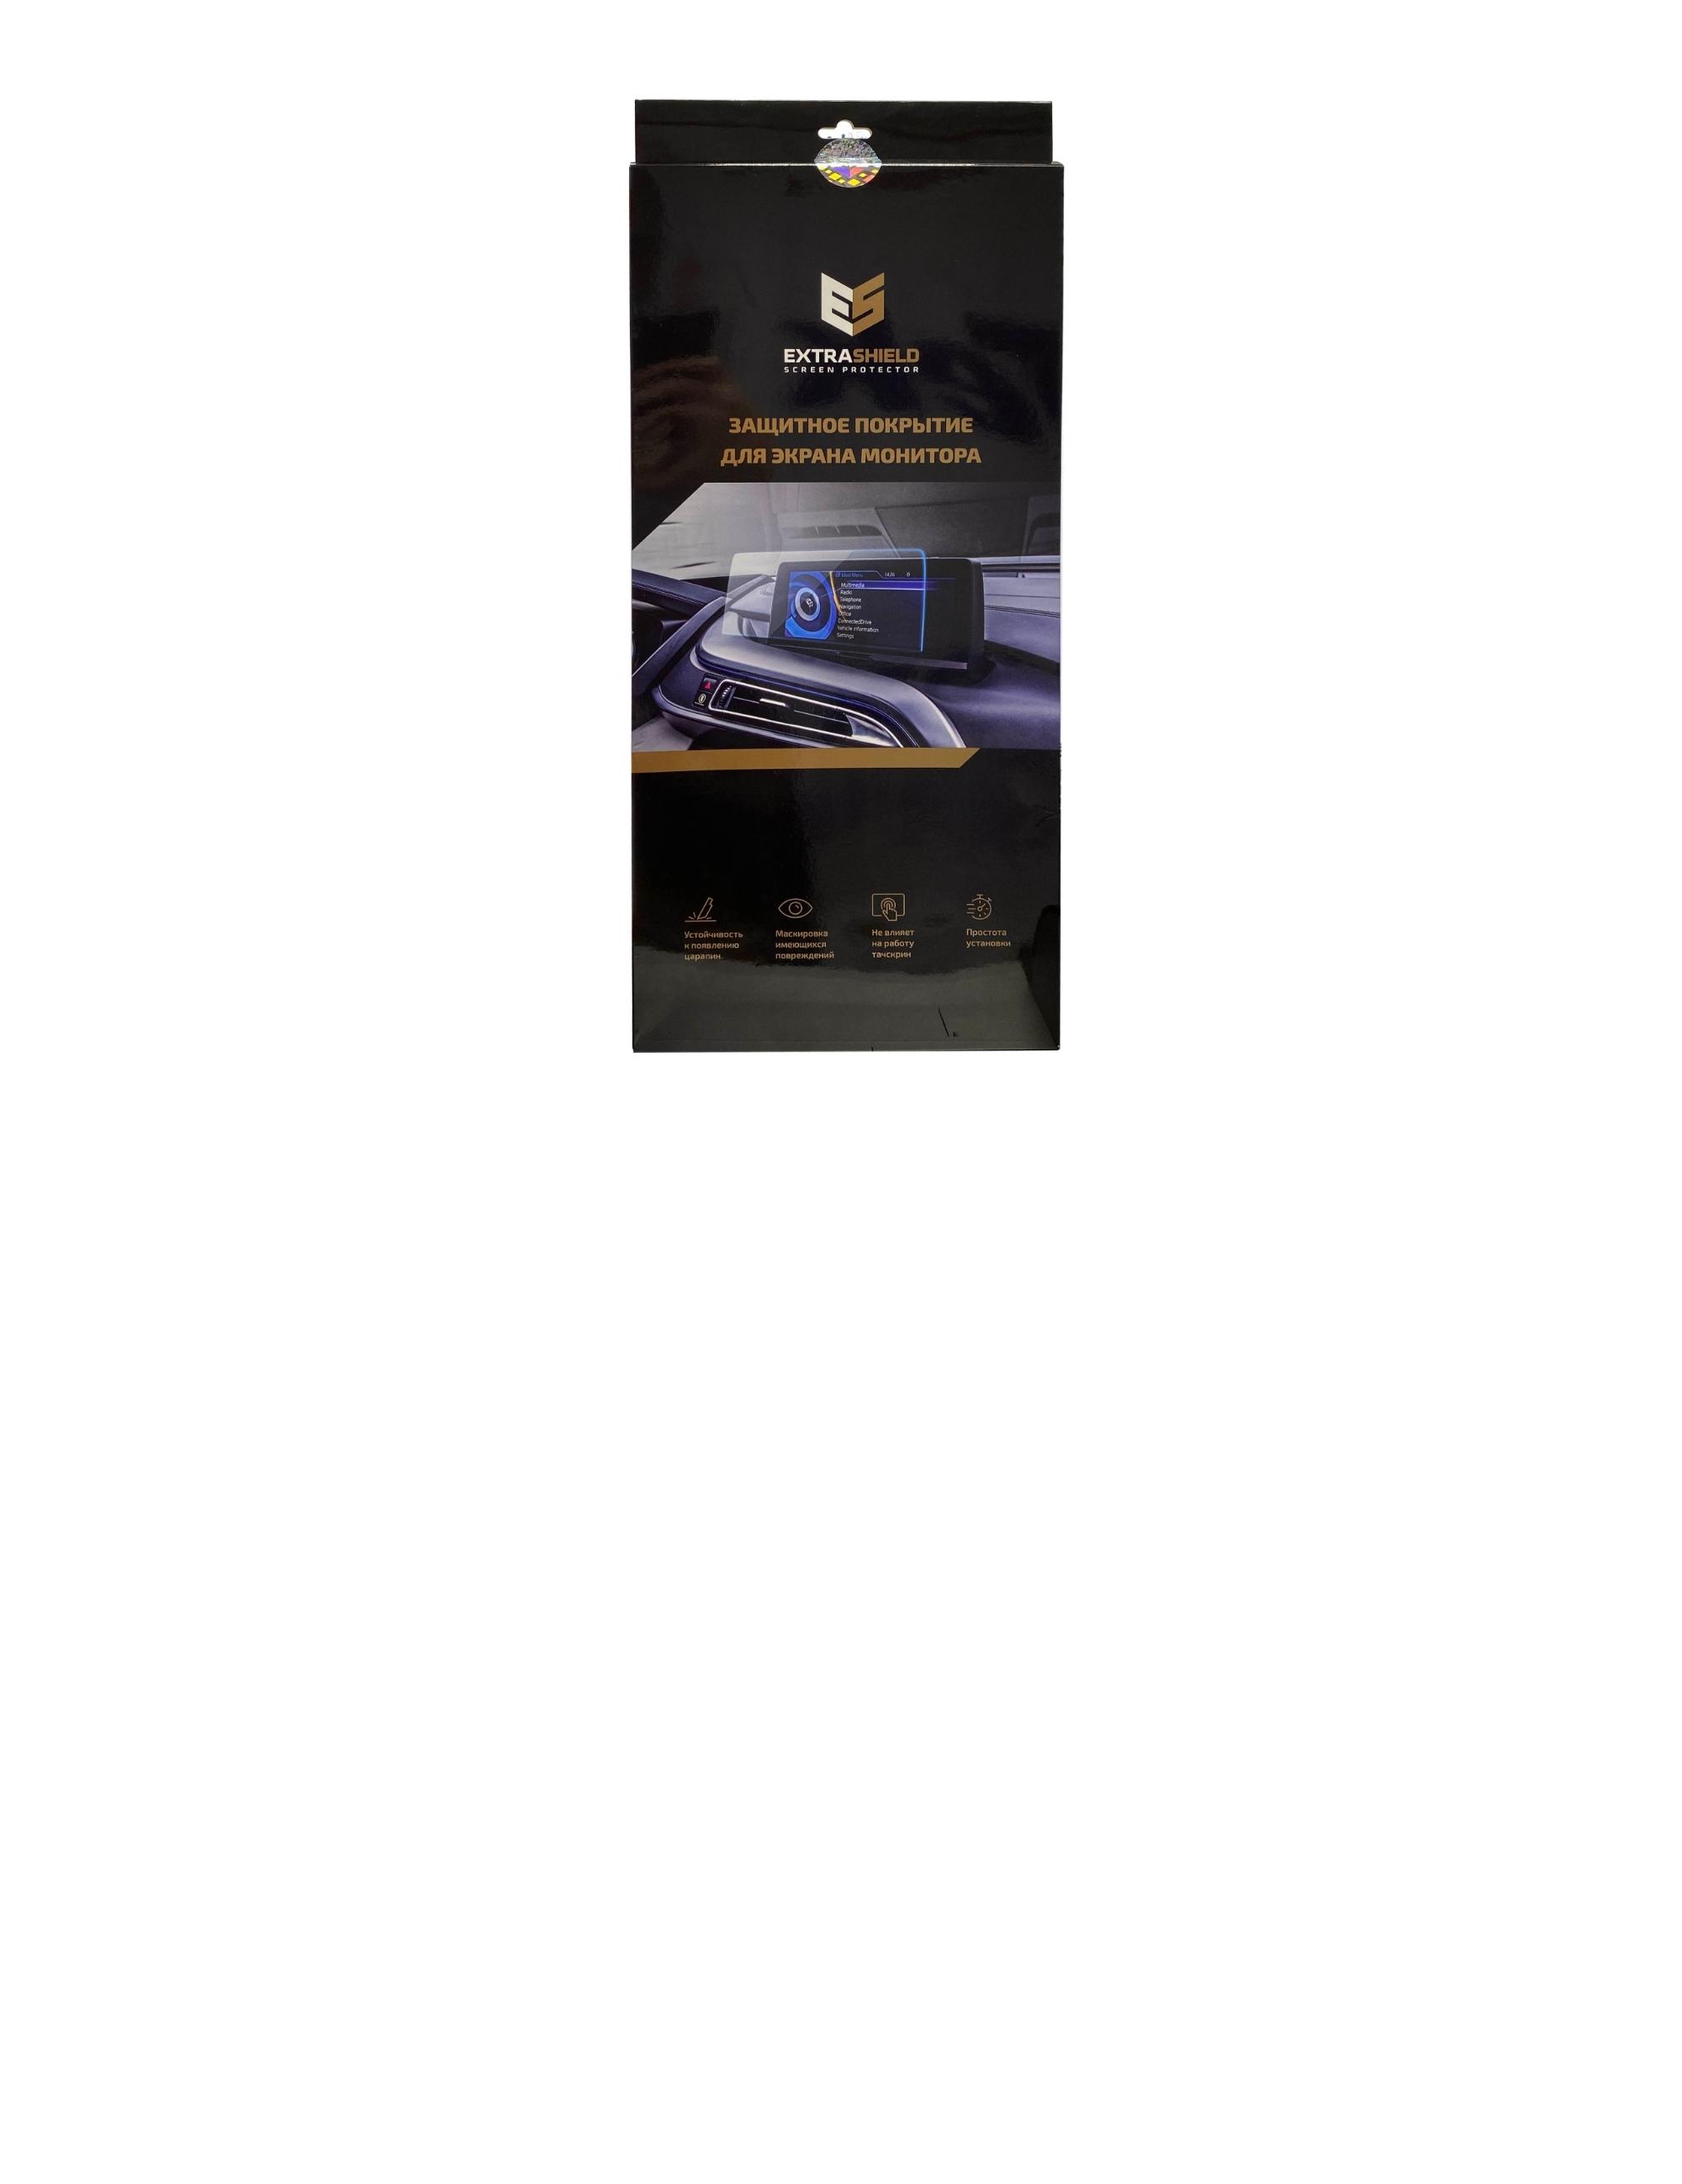 Volkswagen Terramont 2016 - 2020 приборная панель AID 2019 12.3 Защитное стекло Глянец